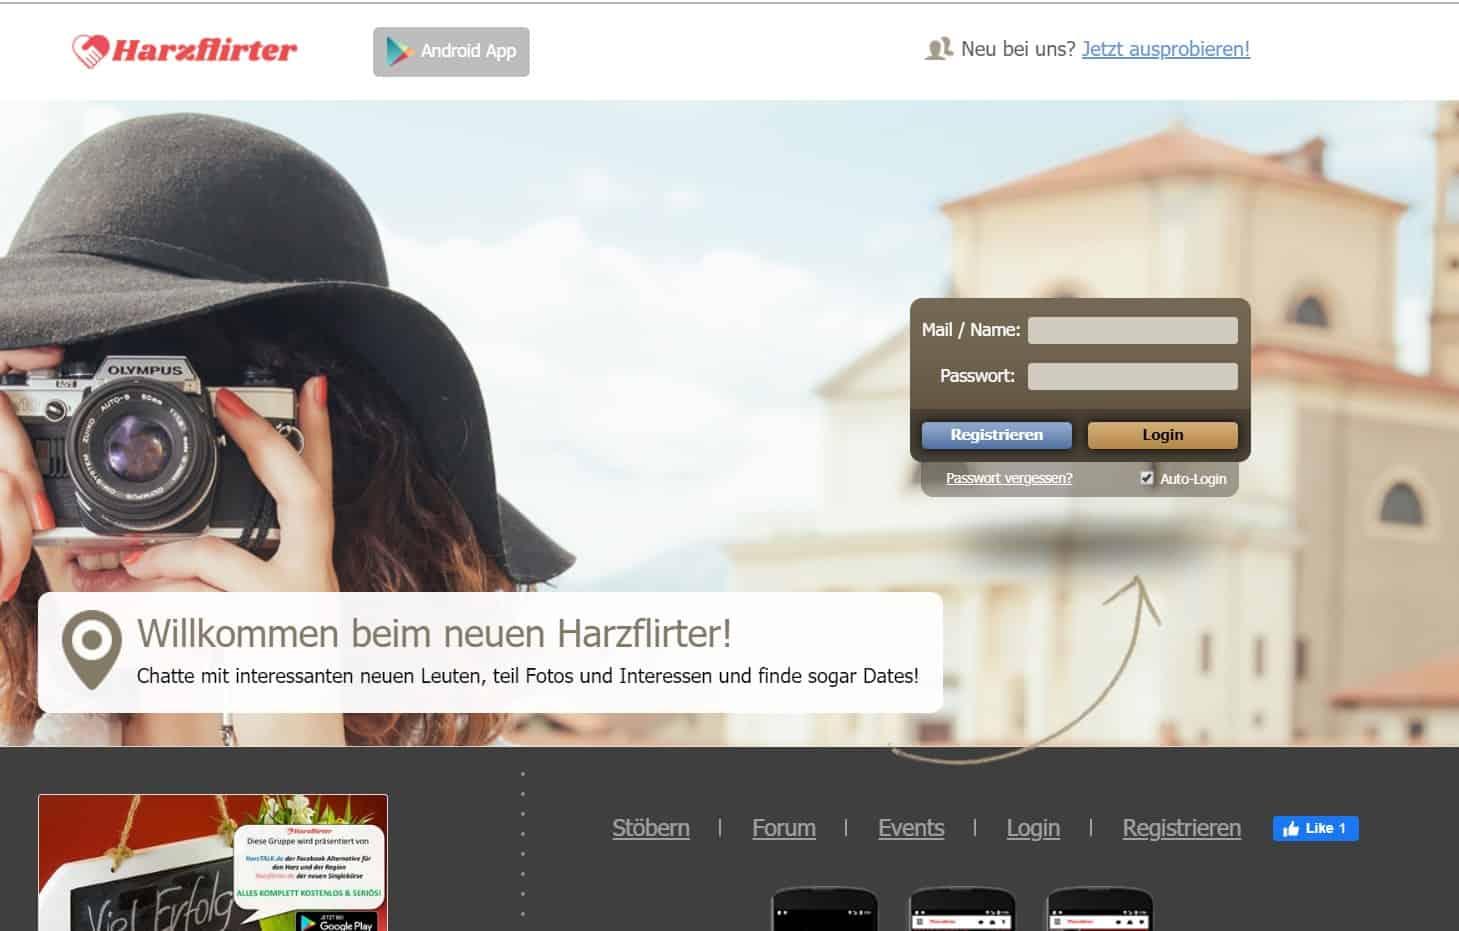 Testbericht: HarzFlirter.de Abzocke